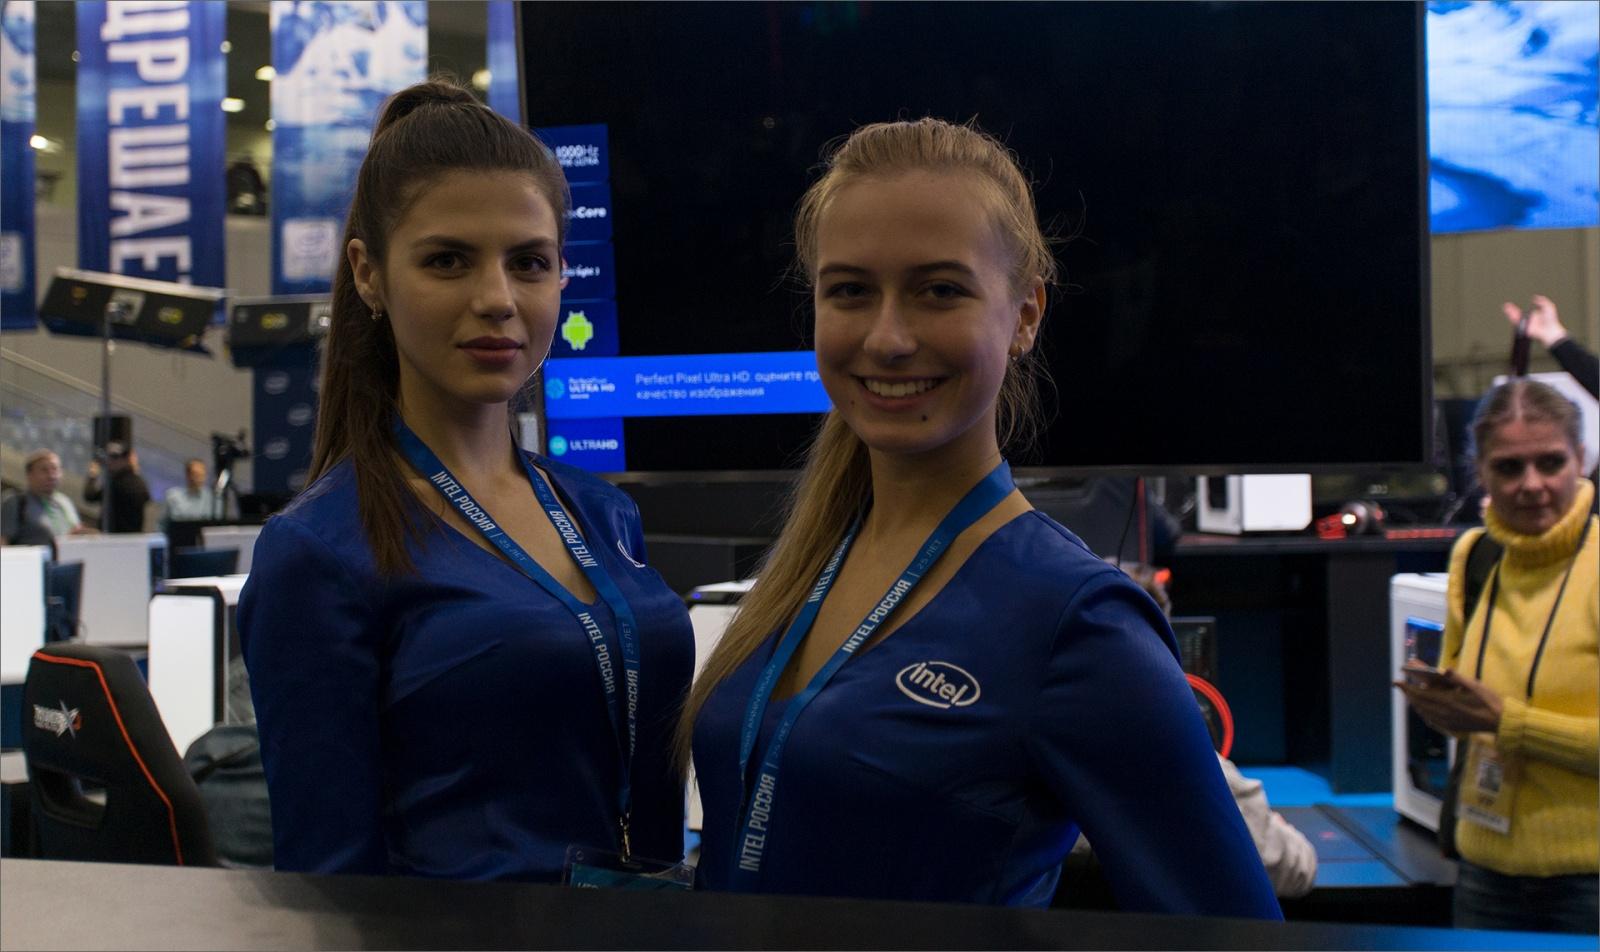 Intel значит побеждать: захват игромира прошёл успешно - 20